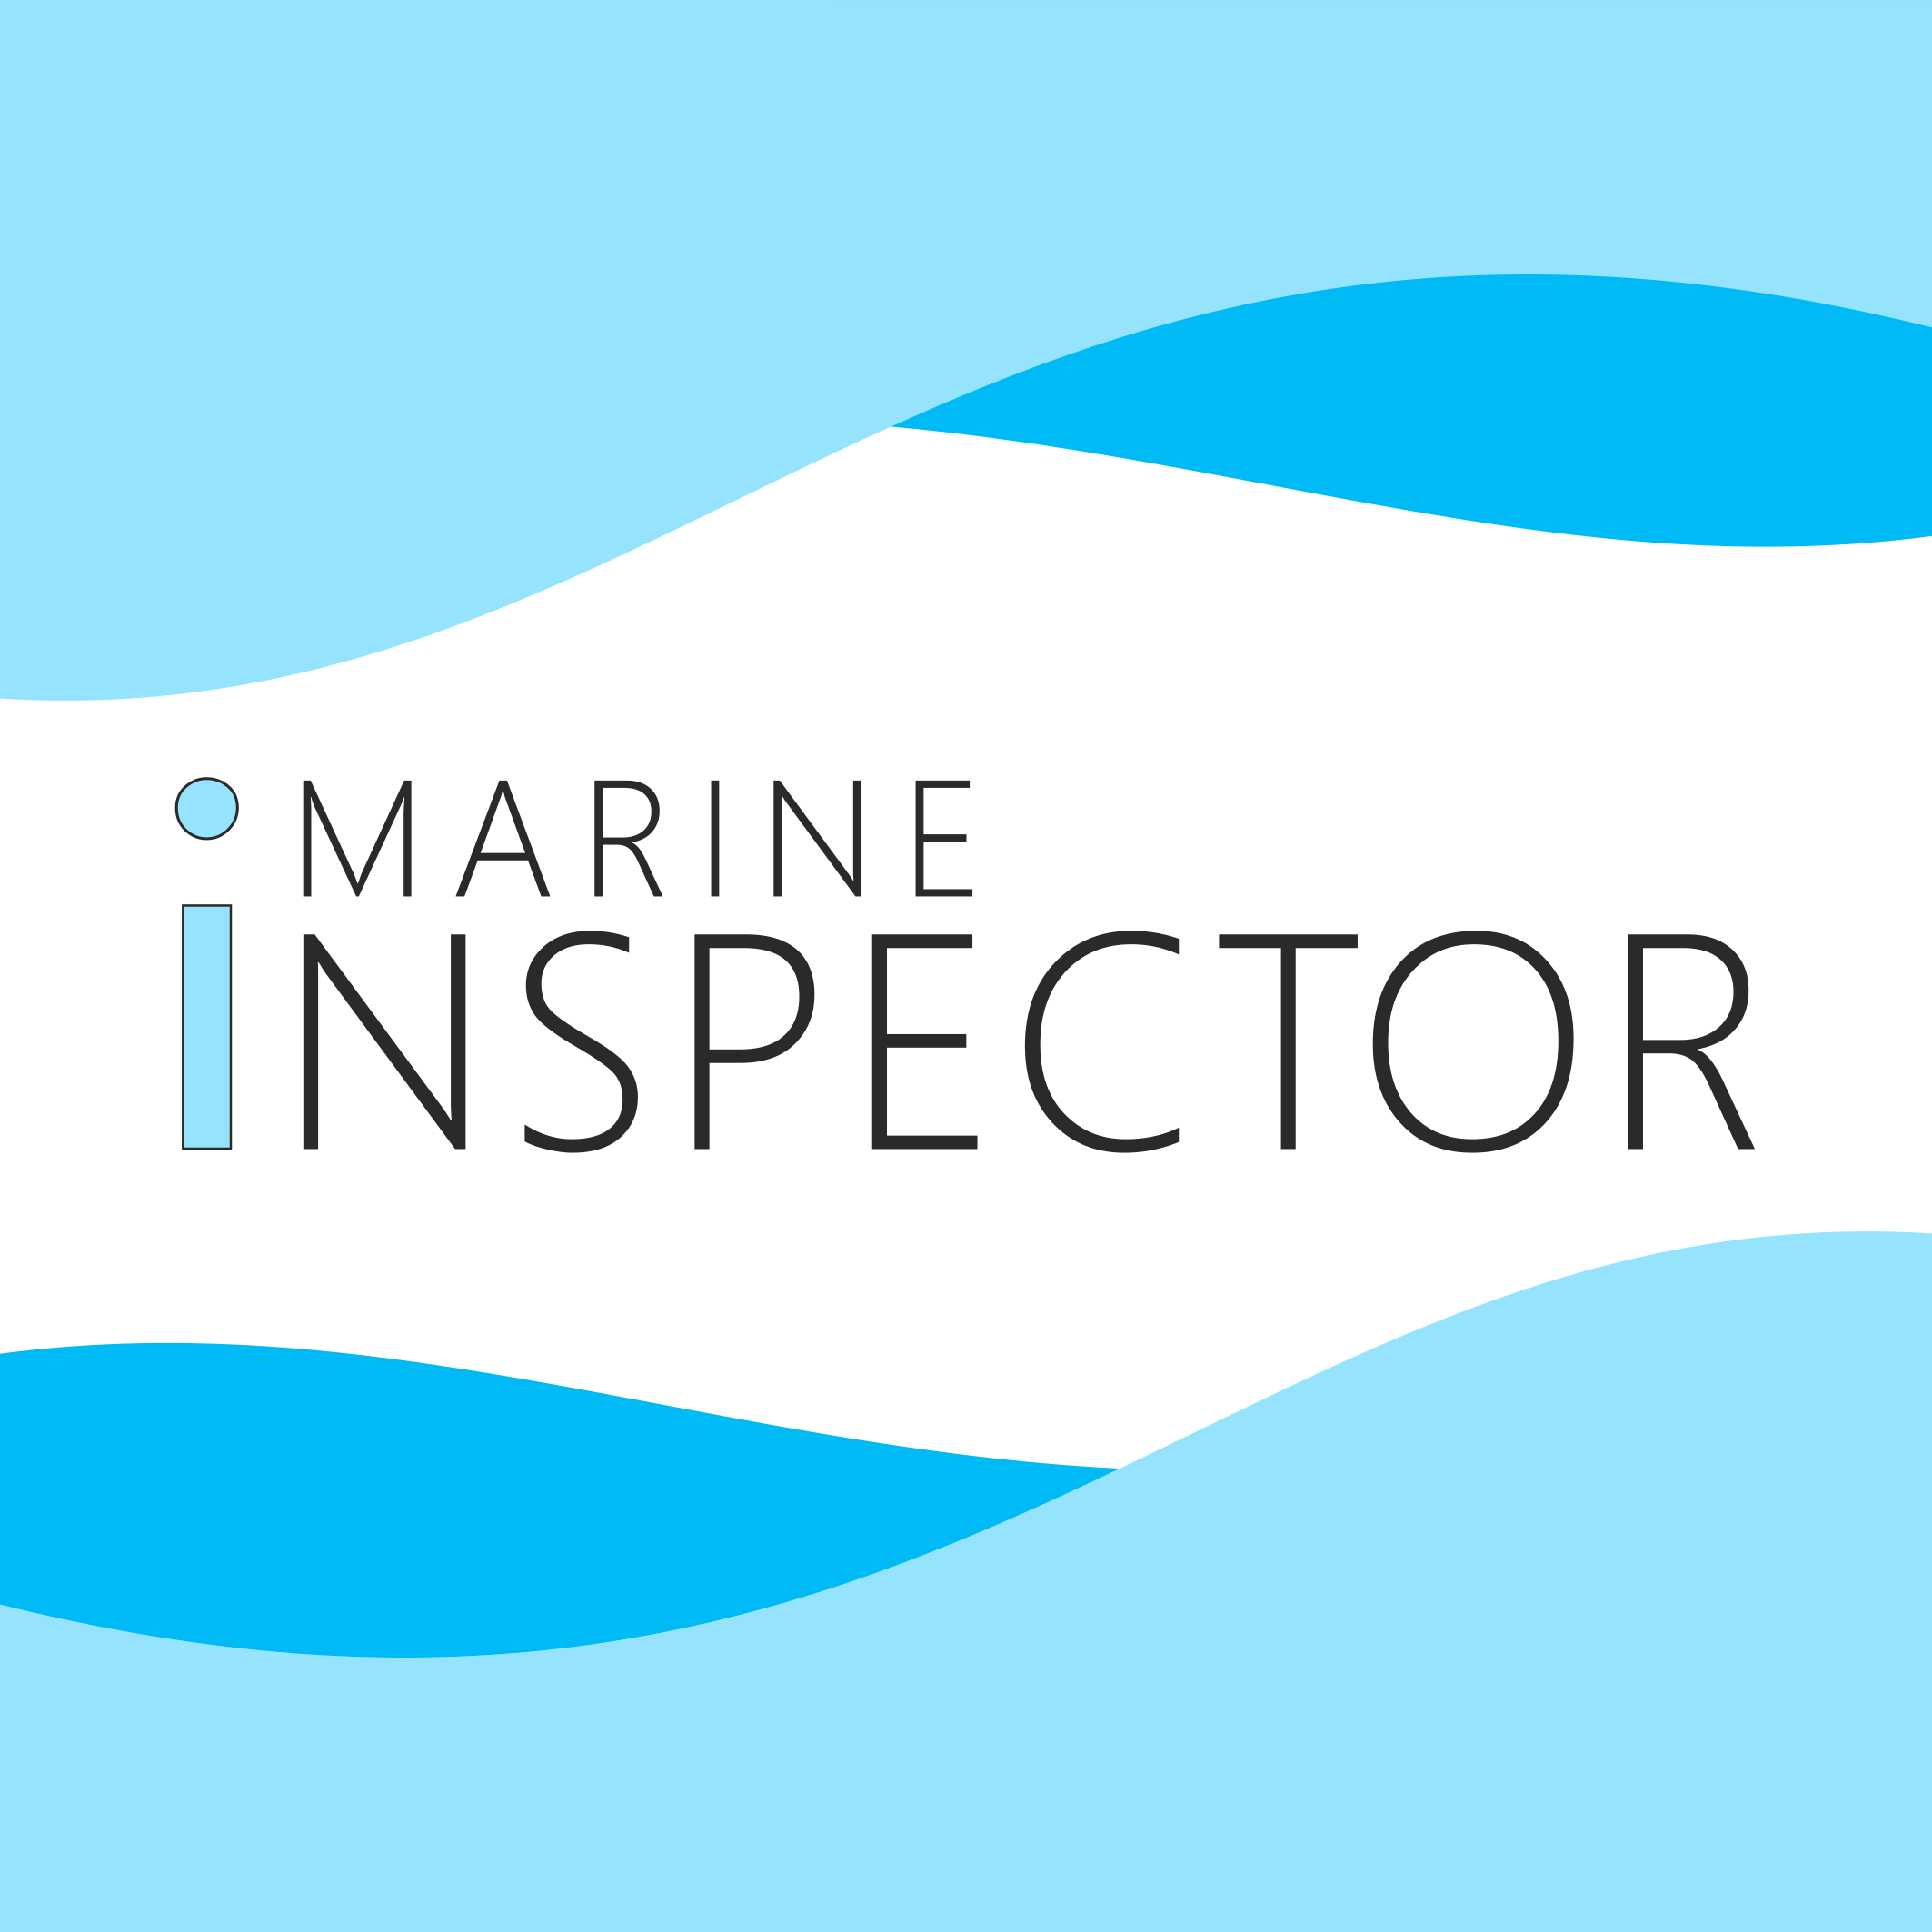 Marine Inspector - сервис для моряков